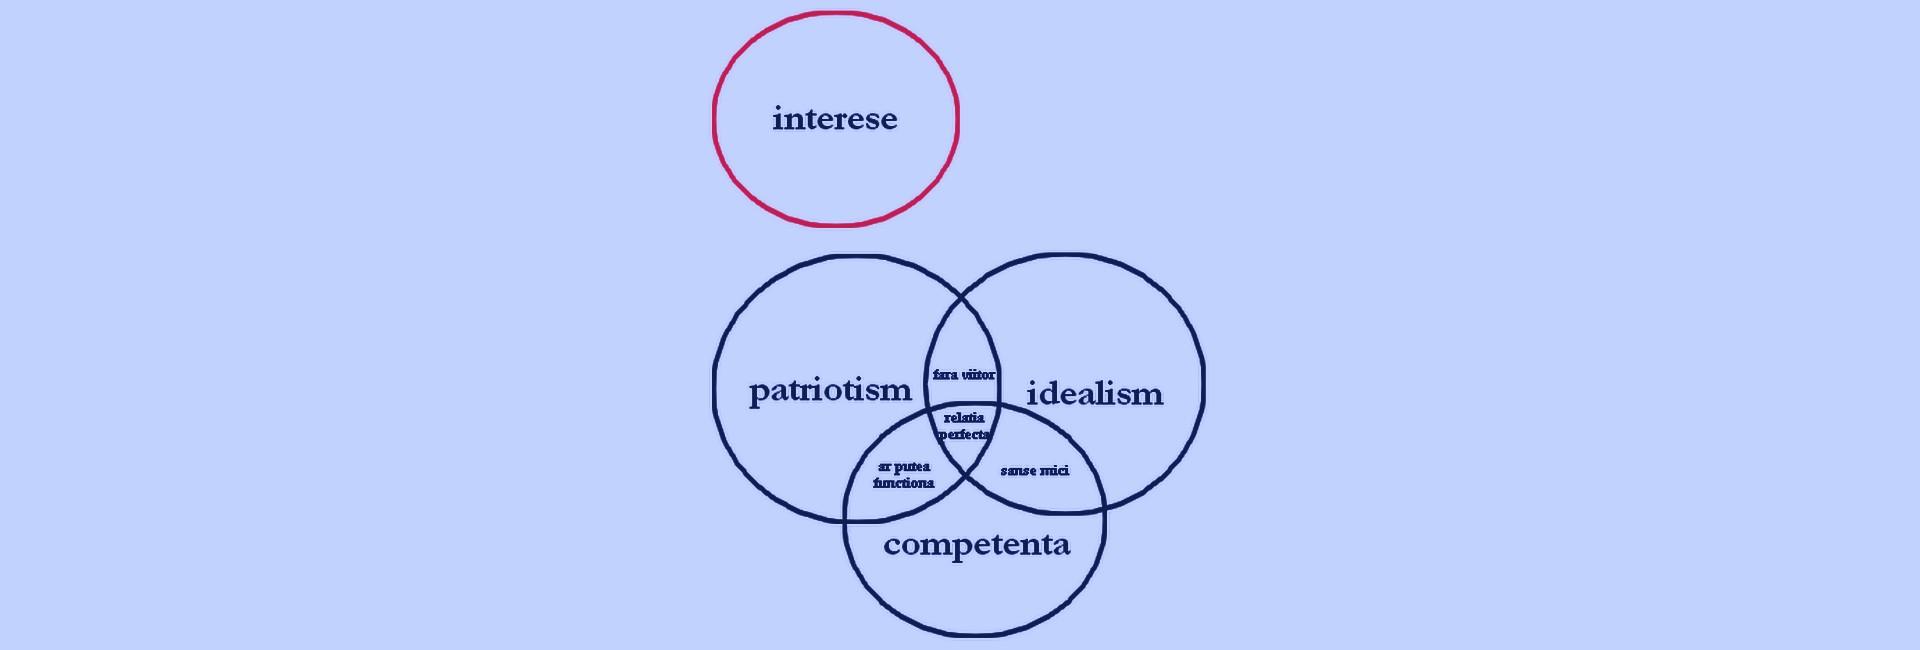 opinie patriotism cu beneficii România slider